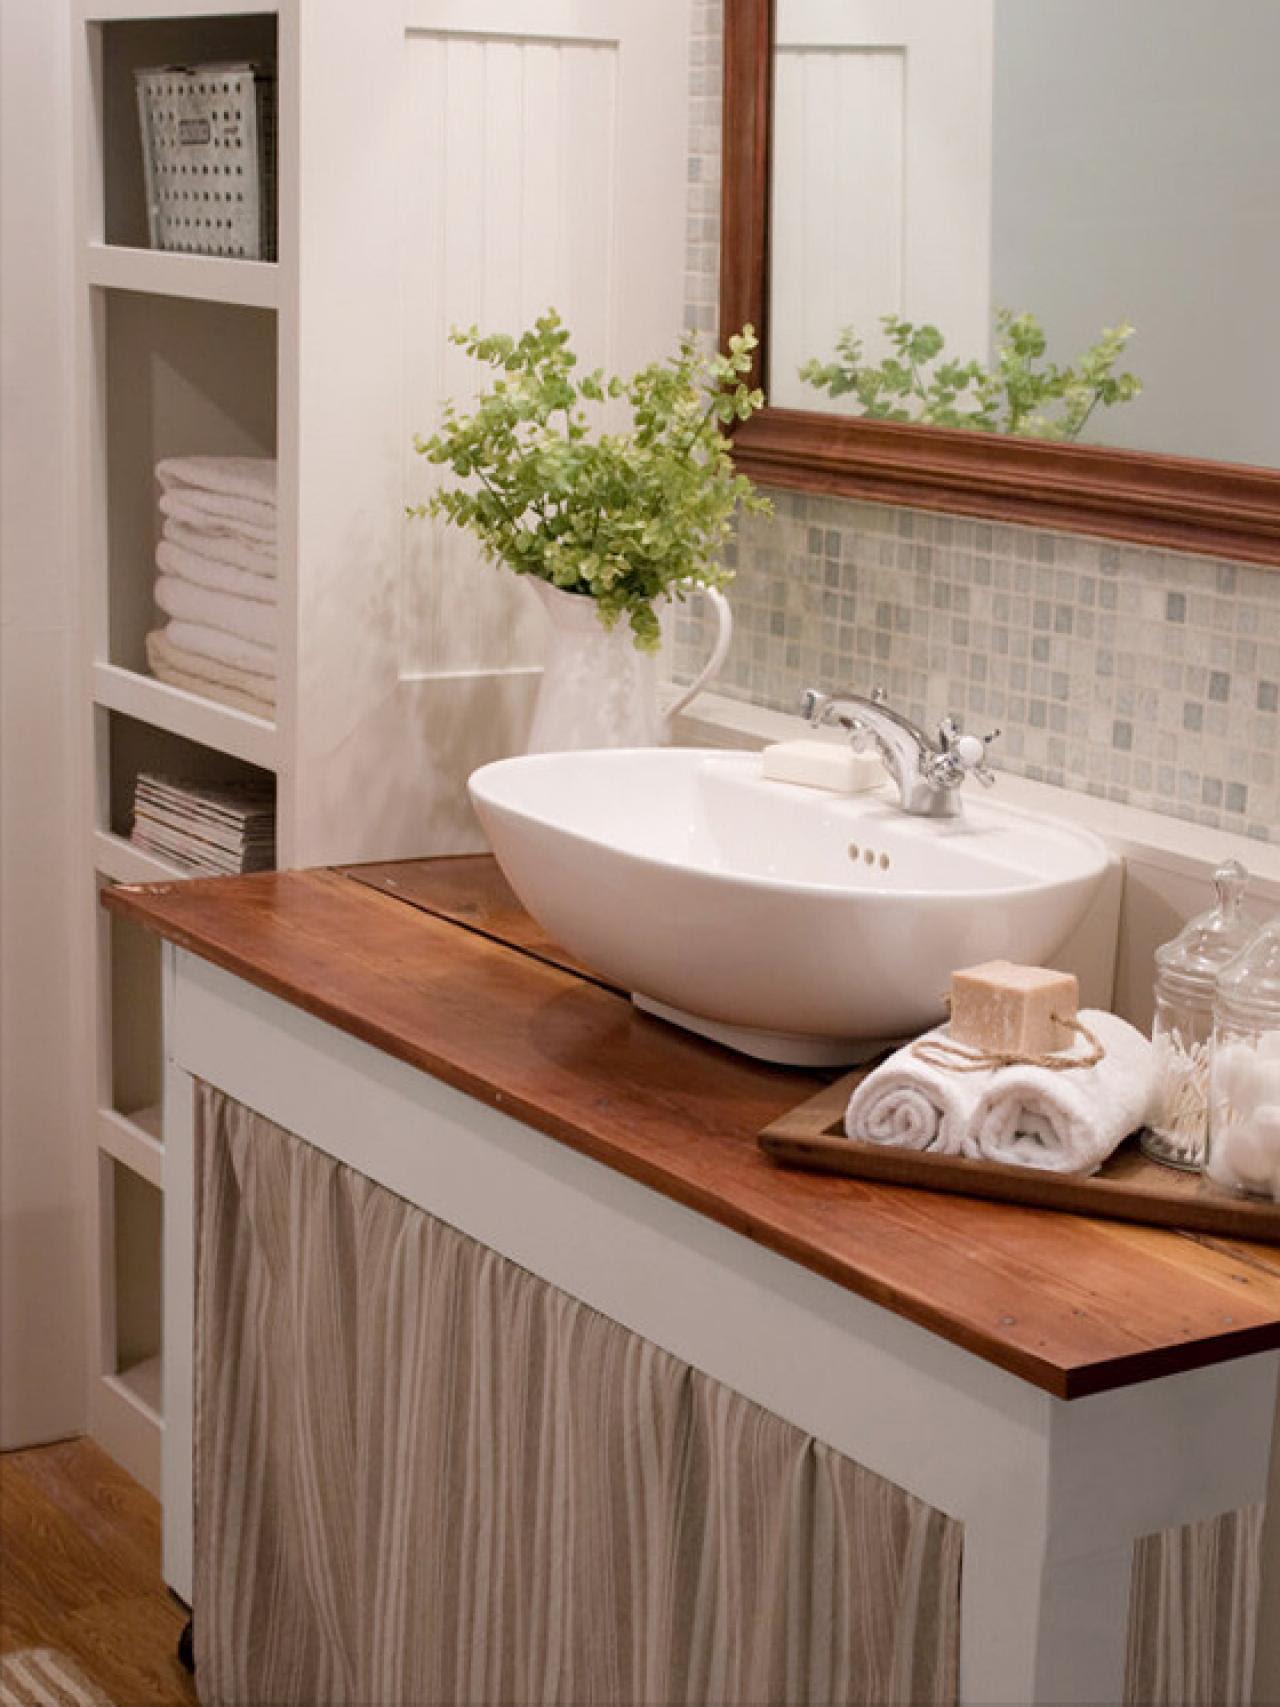 20 Small Bathroom Design Ideas | Bathroom Ideas & Designs ...